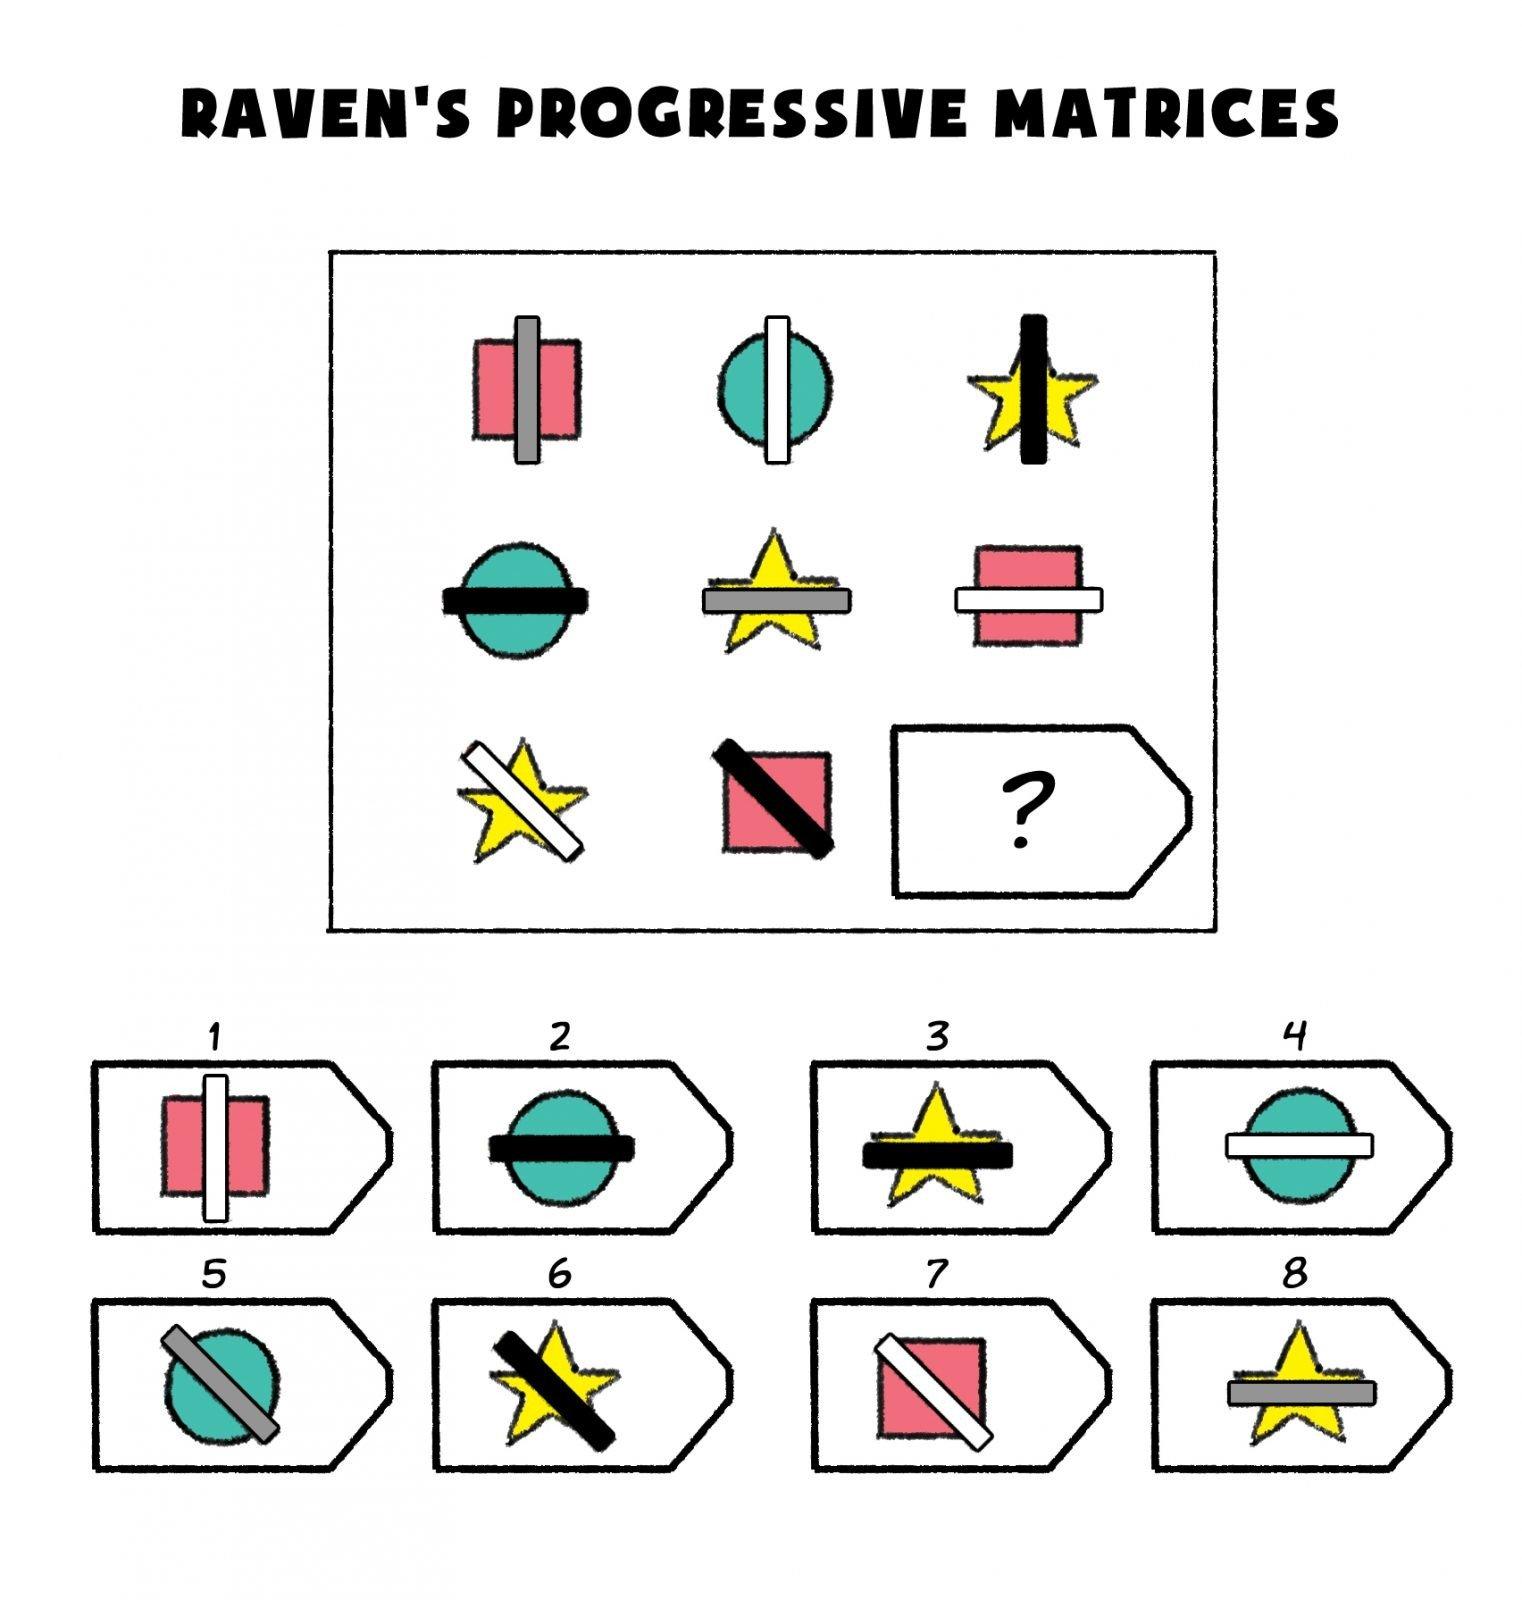 Ravens1